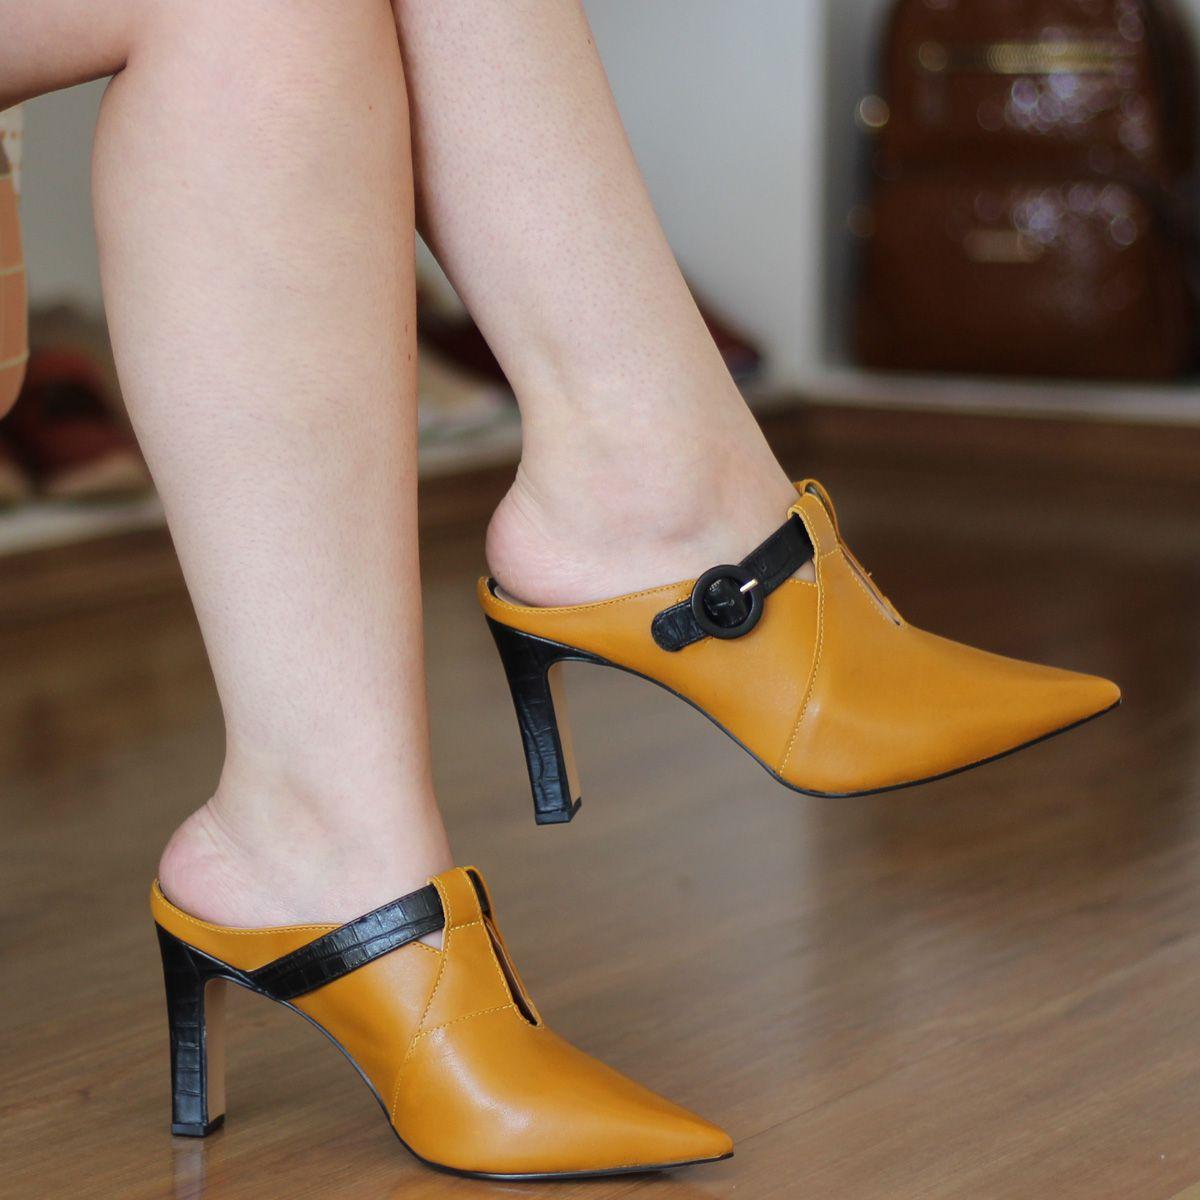 Tamanco Mule Bico Fino Feminino Salto Alto em couro Amarelo 4202